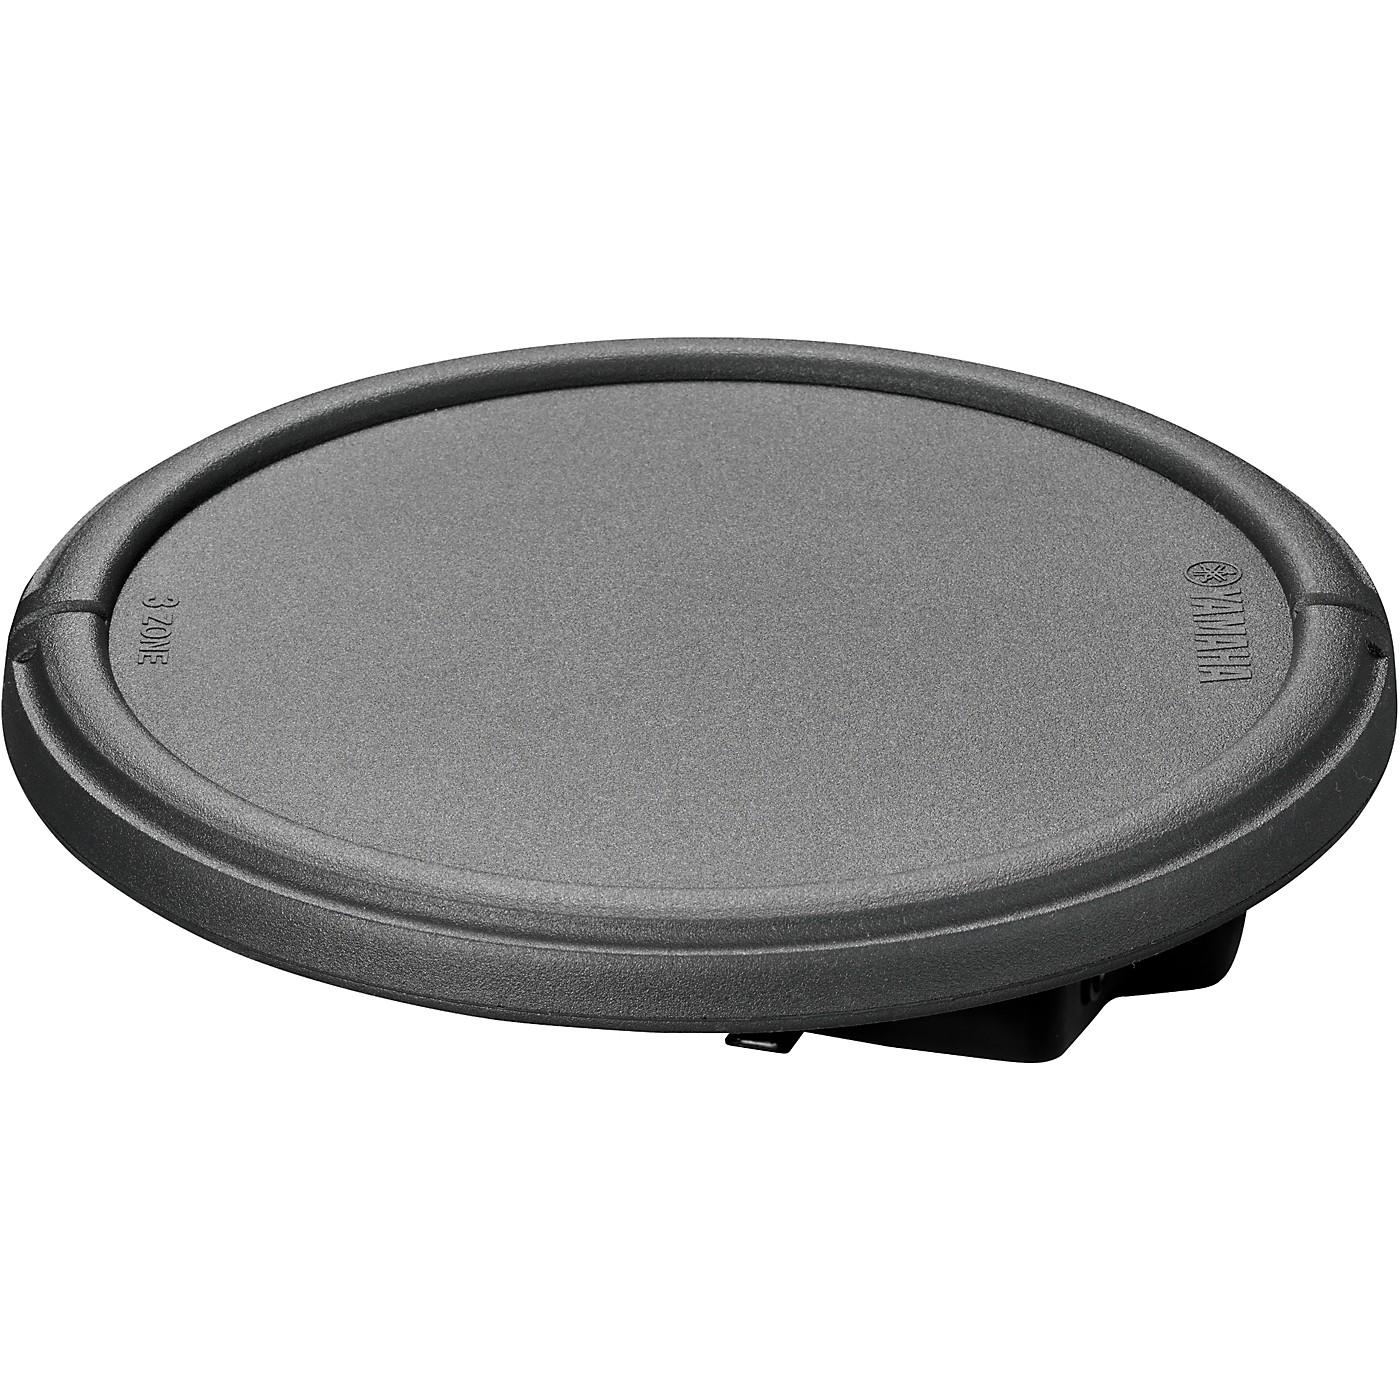 Yamaha 3-Zone Electronic Drum Pad thumbnail